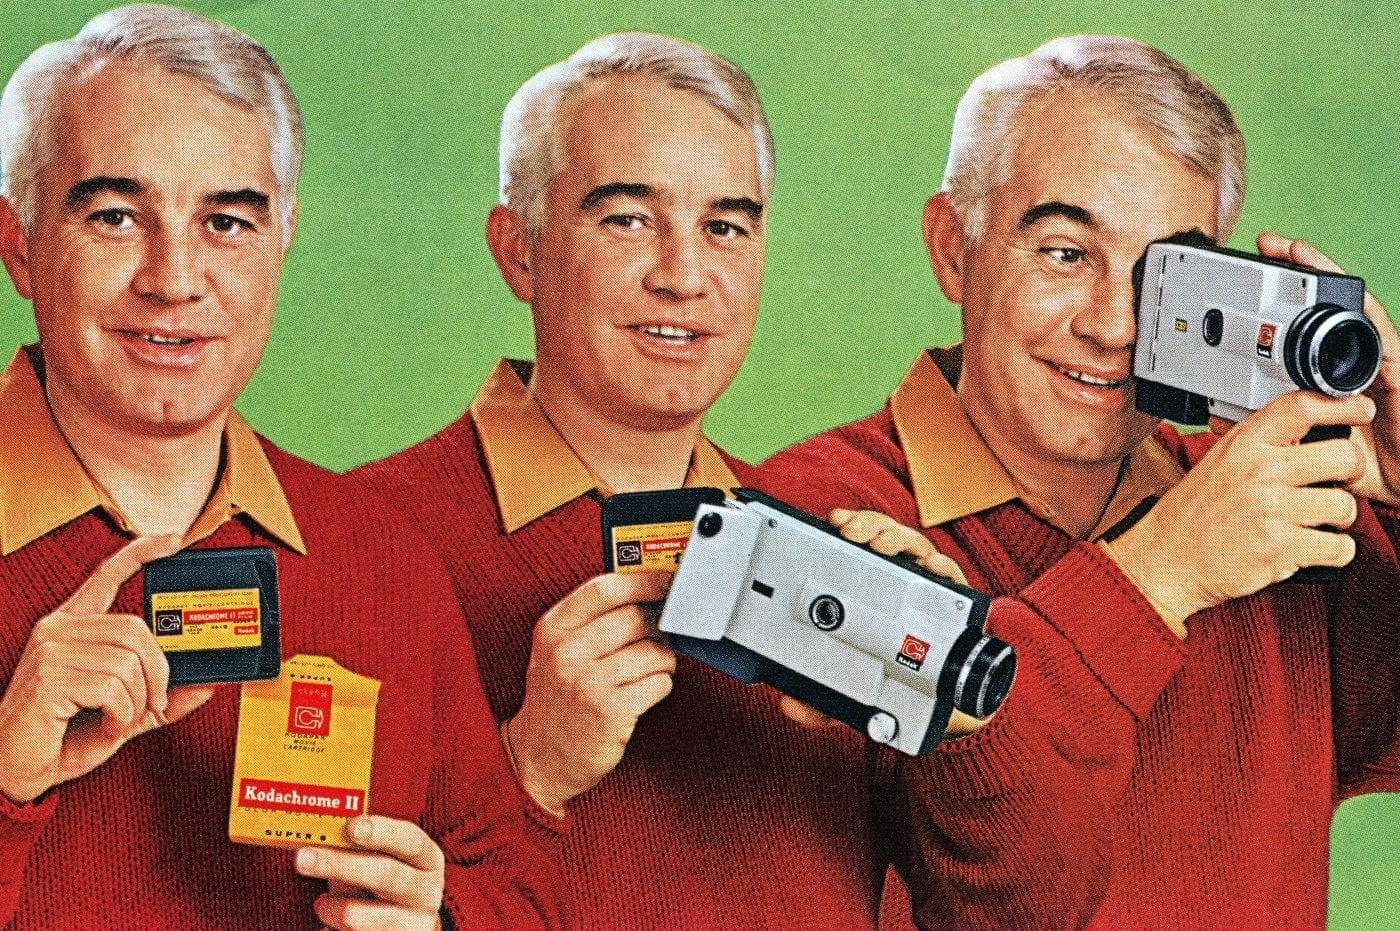 Kodak Instamatic movie cameras from the 1960s